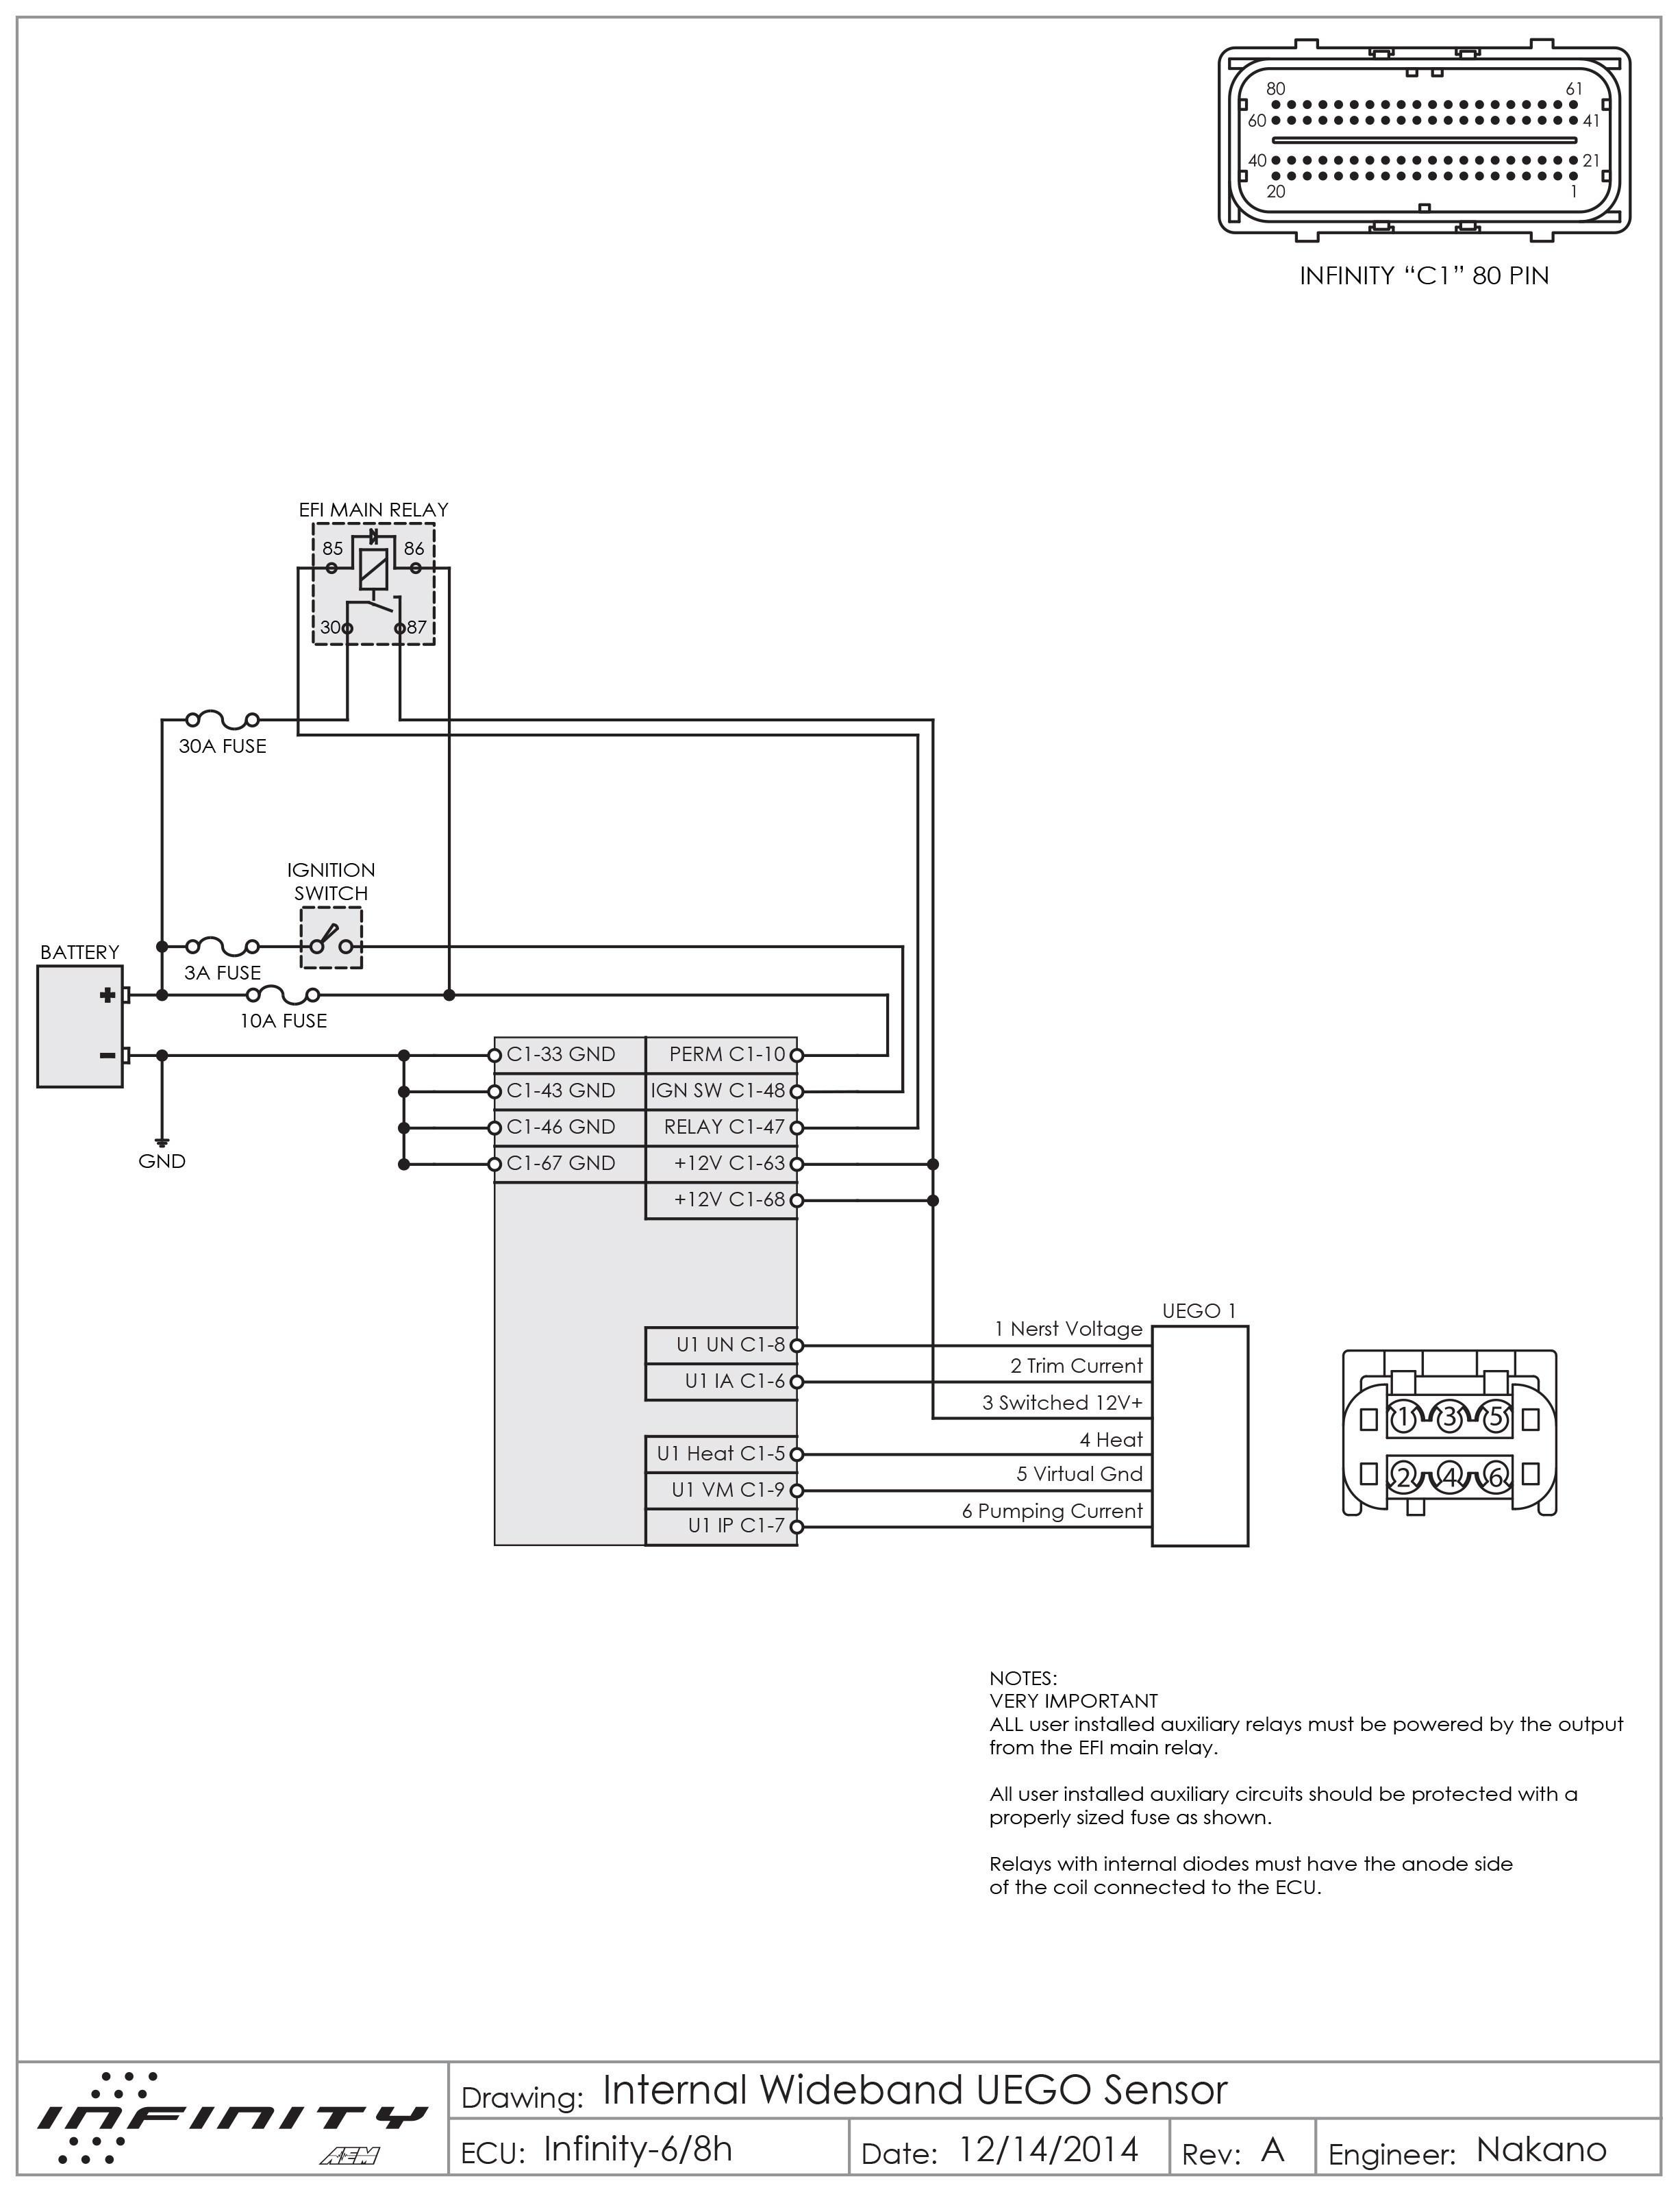 Luxury Aem Wideband Wiring Diagram Wiring Aem Wideband Wiring Diagram Best Aem Wideband Wiring Diagram